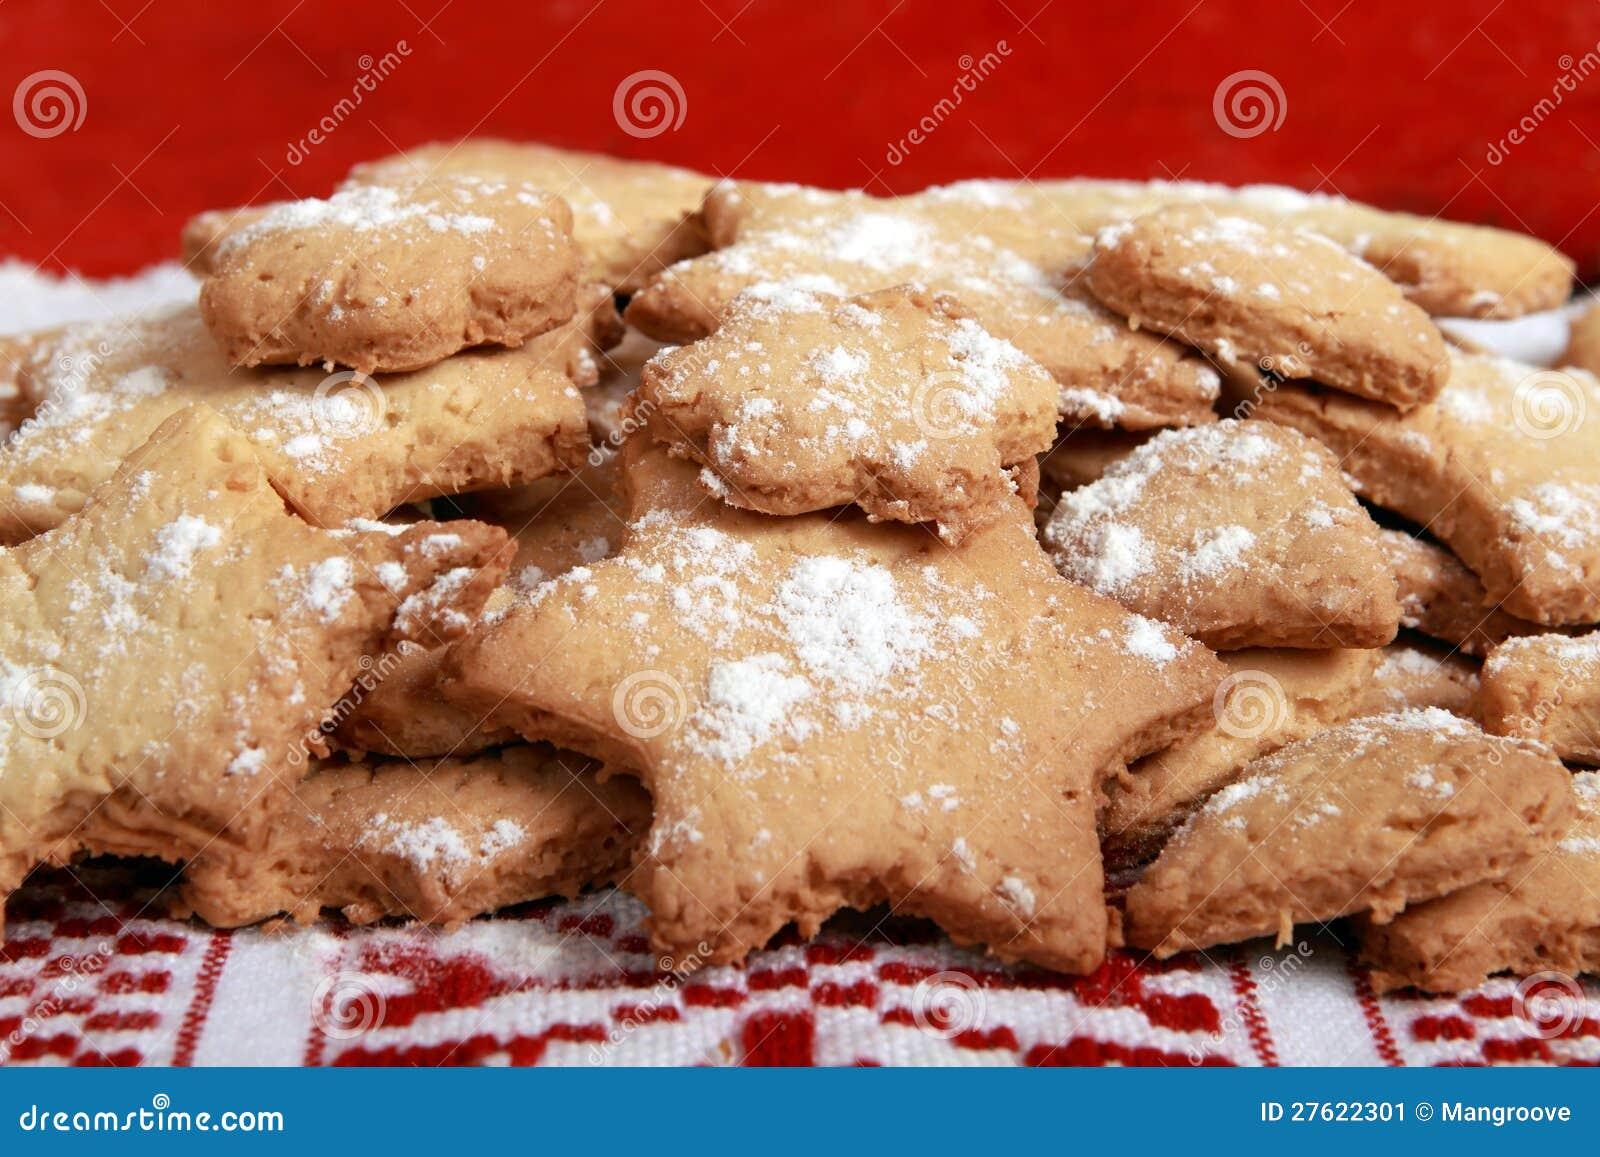 Homemade Romanian Cookies : Romania Stock Image - Image ...